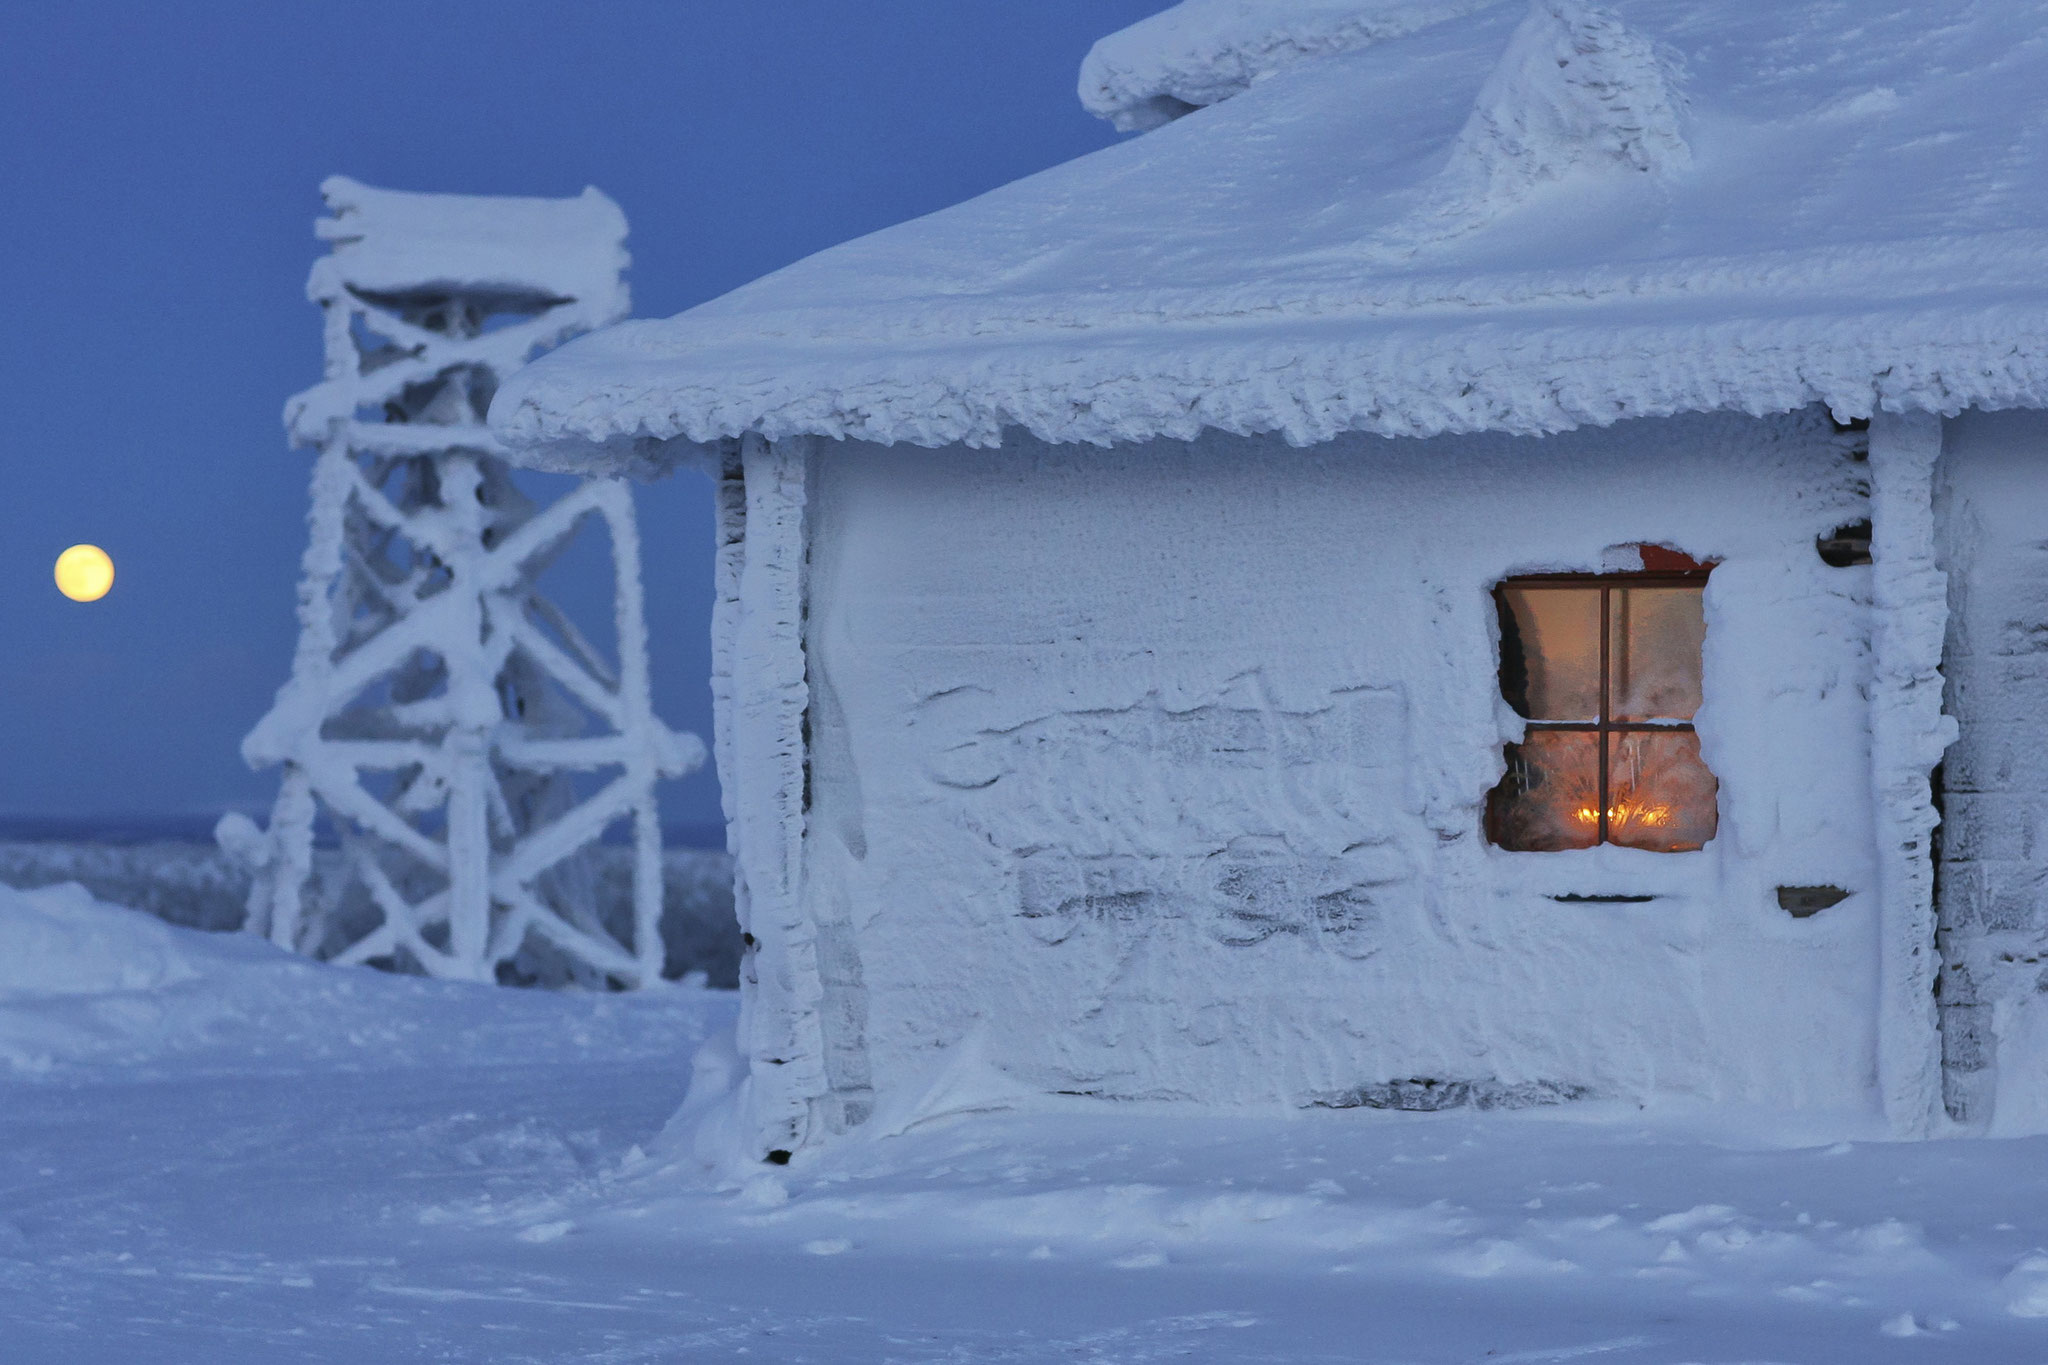 © Hans G. Lehmann | Vereiste Skihütte in Saariselkä auf dem Berg Kaunispää, Lappland/Finnland